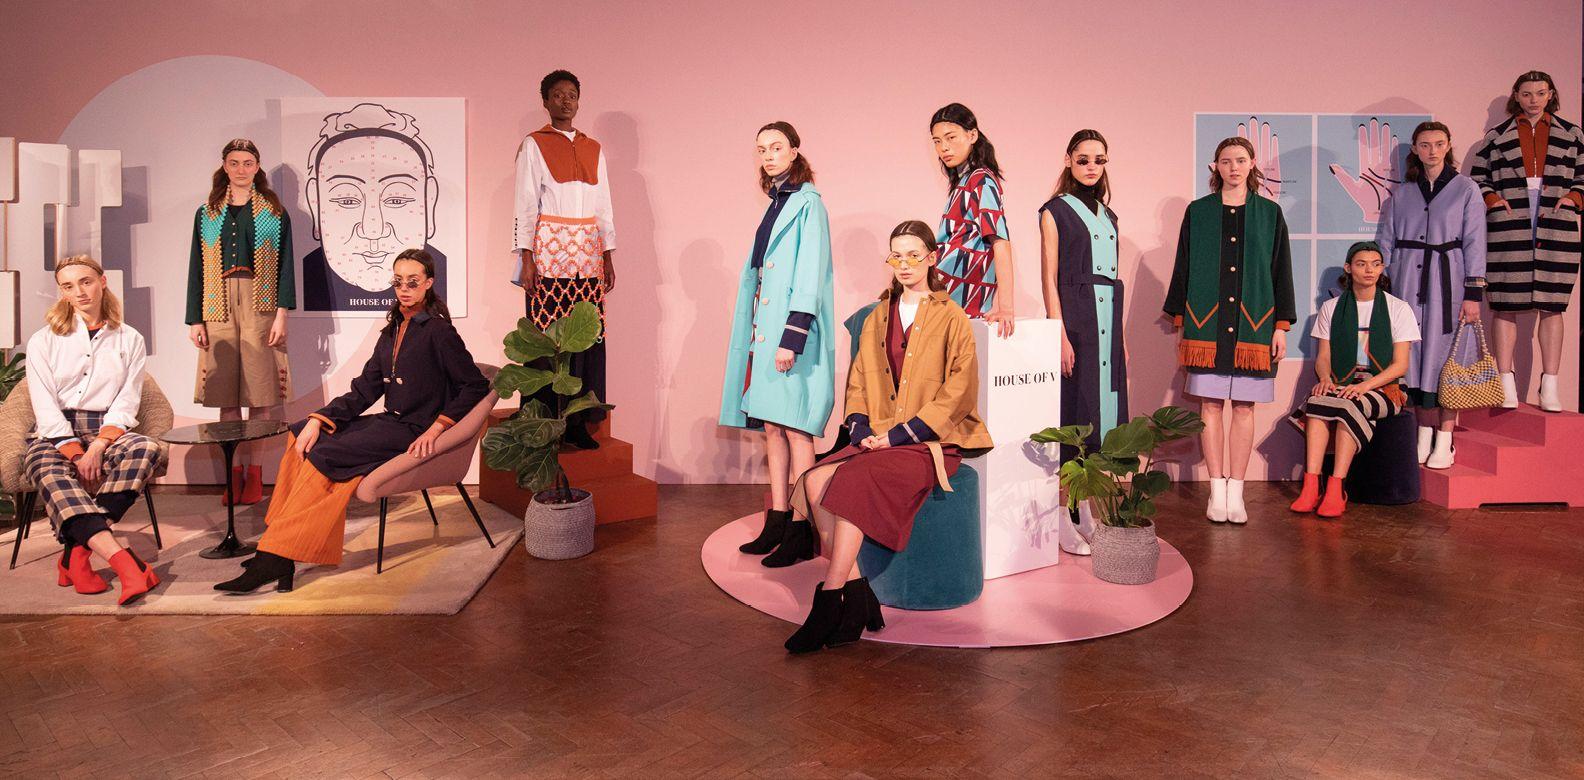 Worldly Aspirations: HKTDC's Fashion Hong Kong Campaign In London Fashion Week